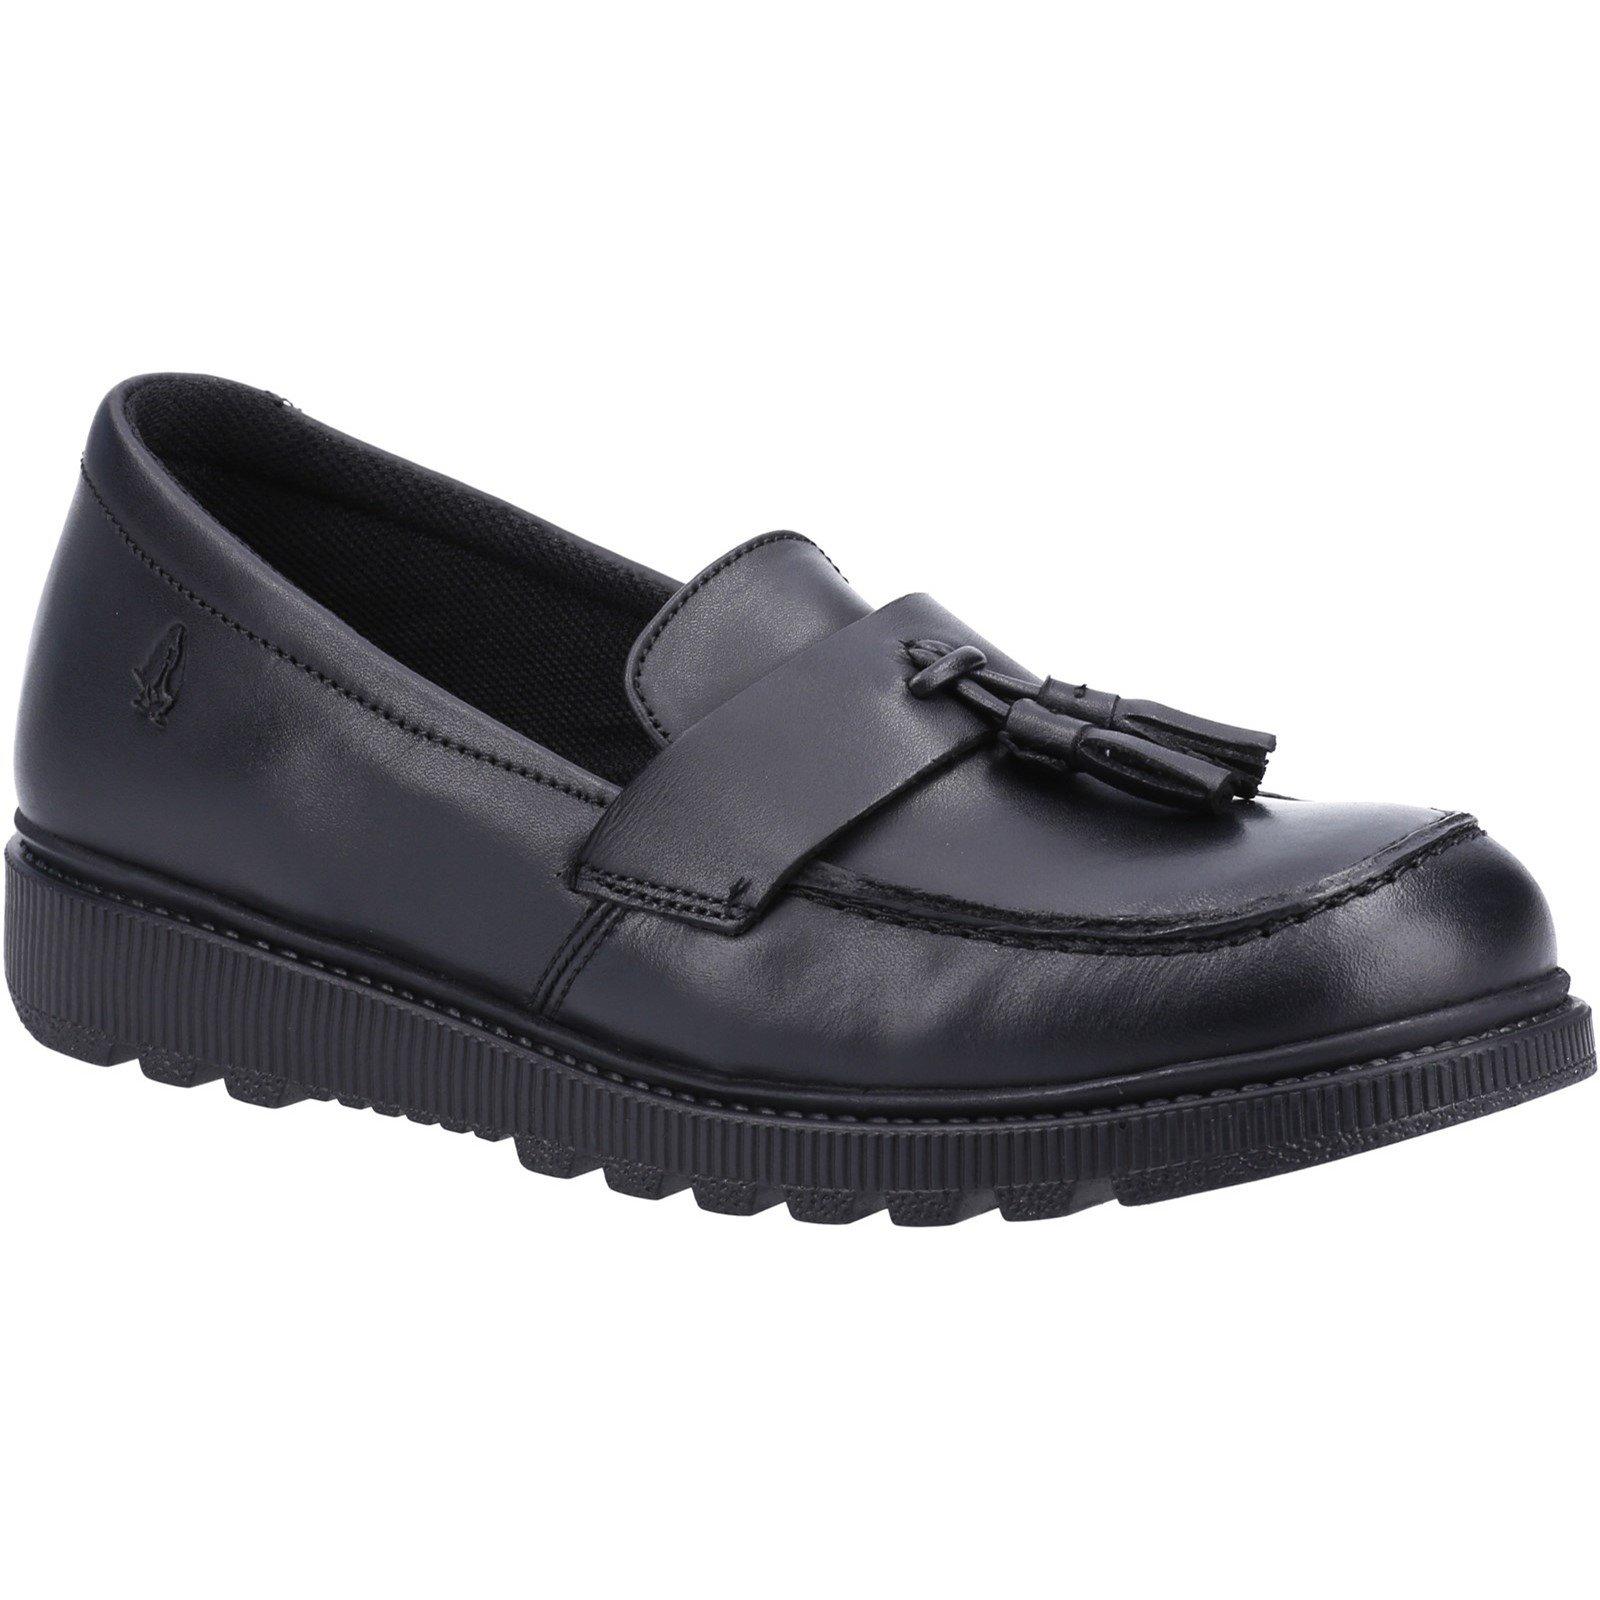 Hush Puppies Kid's Faye Senior School Shoe Patent Black 30844 - Patent Black 3